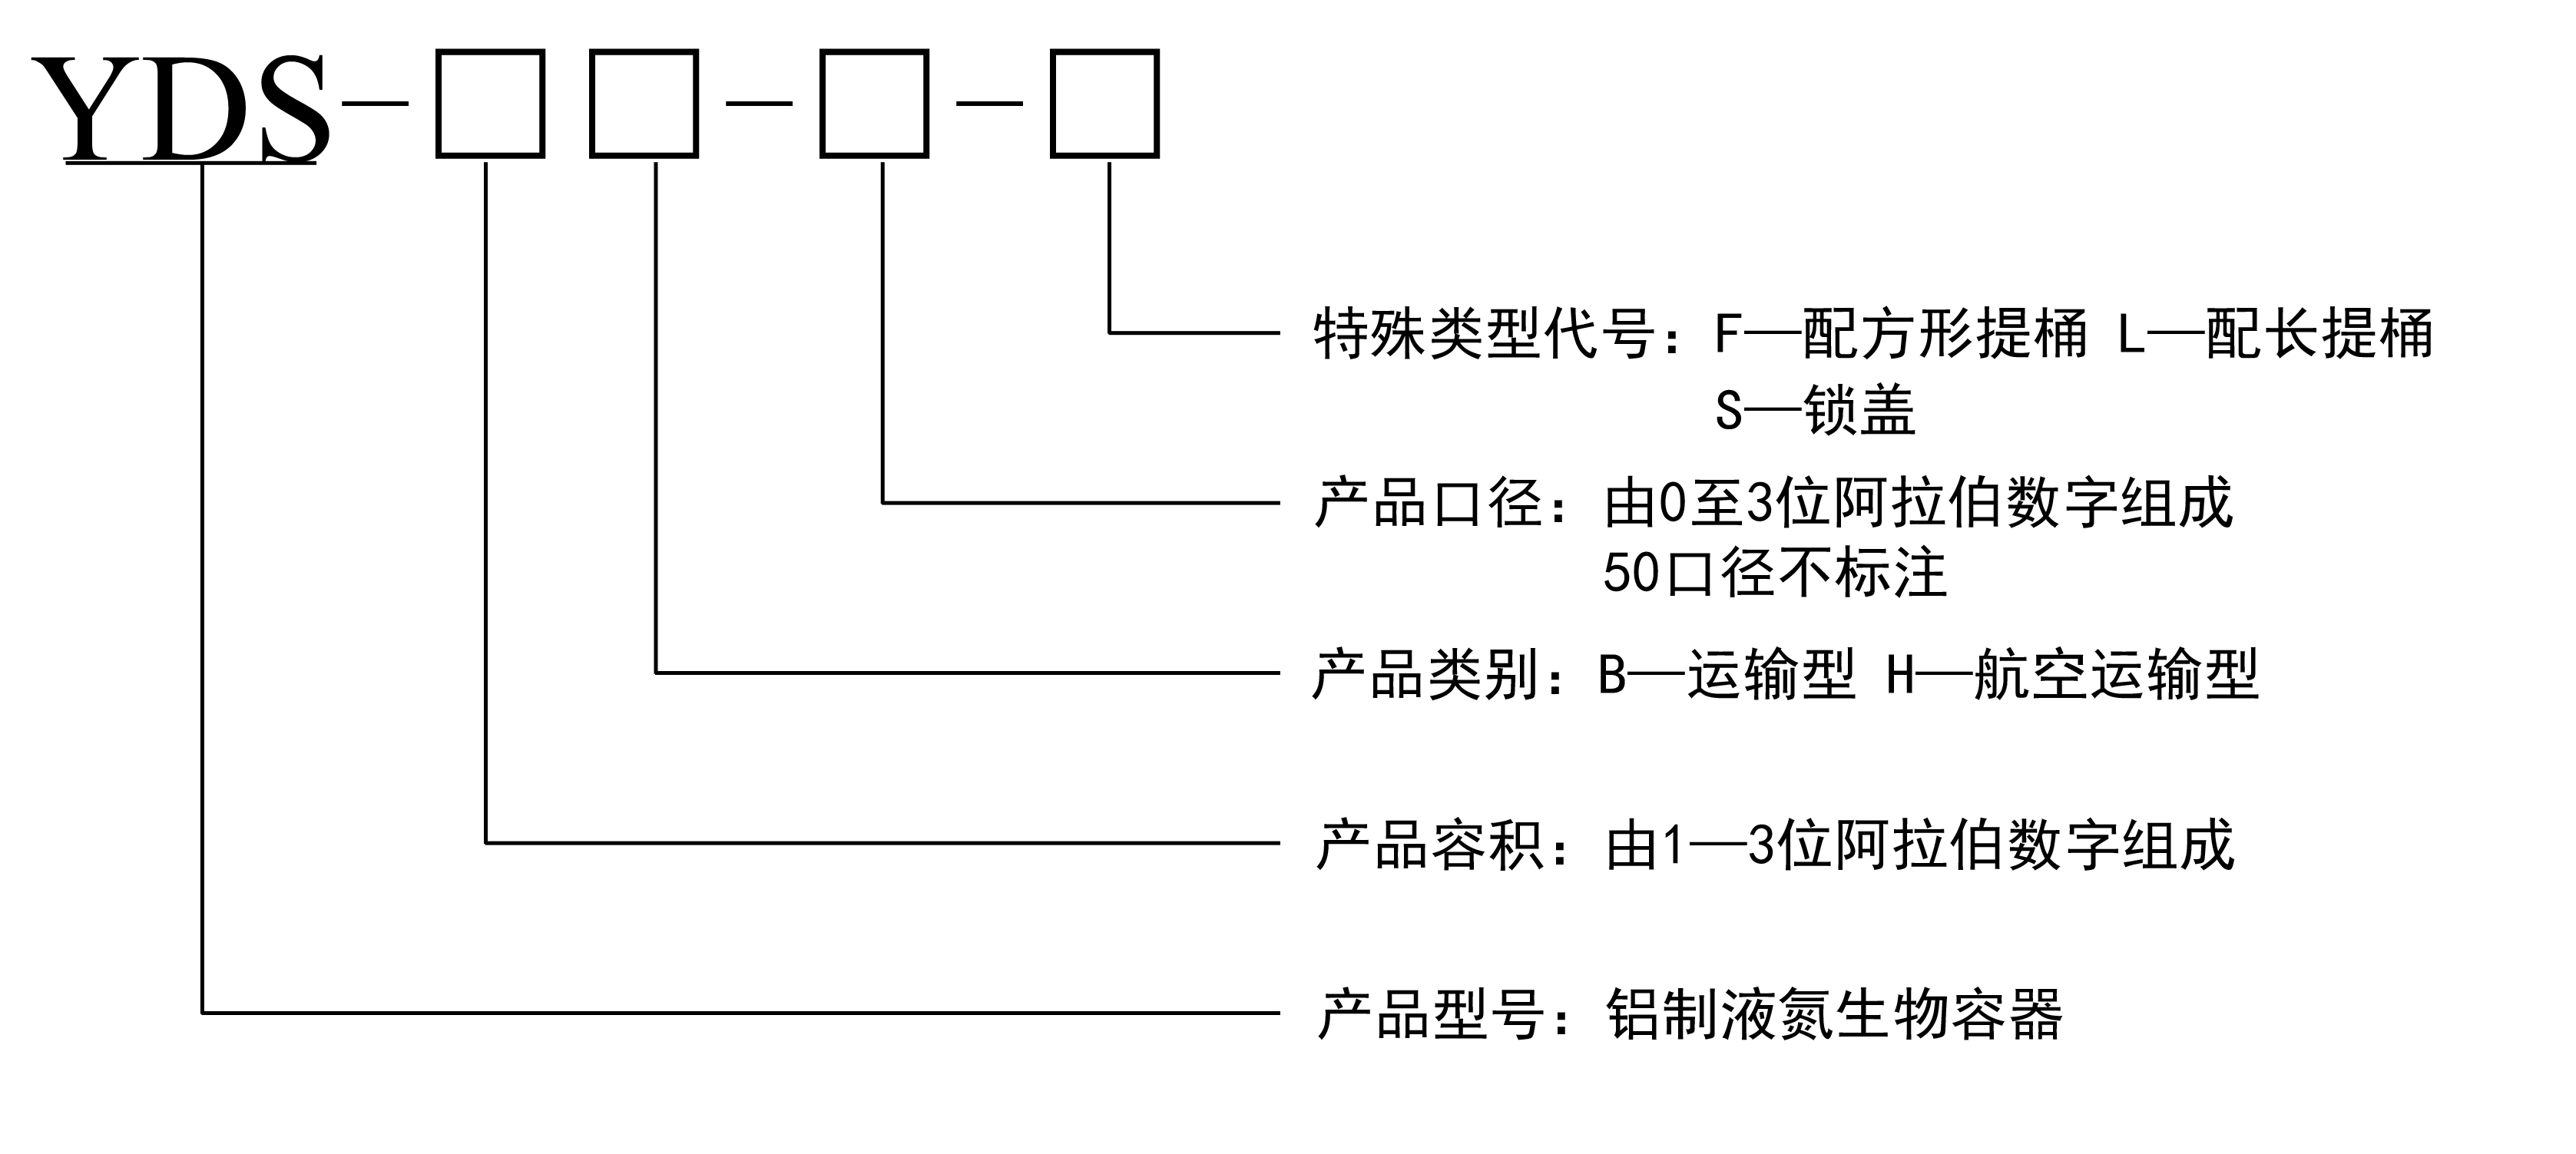 YDH-3  DS航空运输铝合金液氮罐